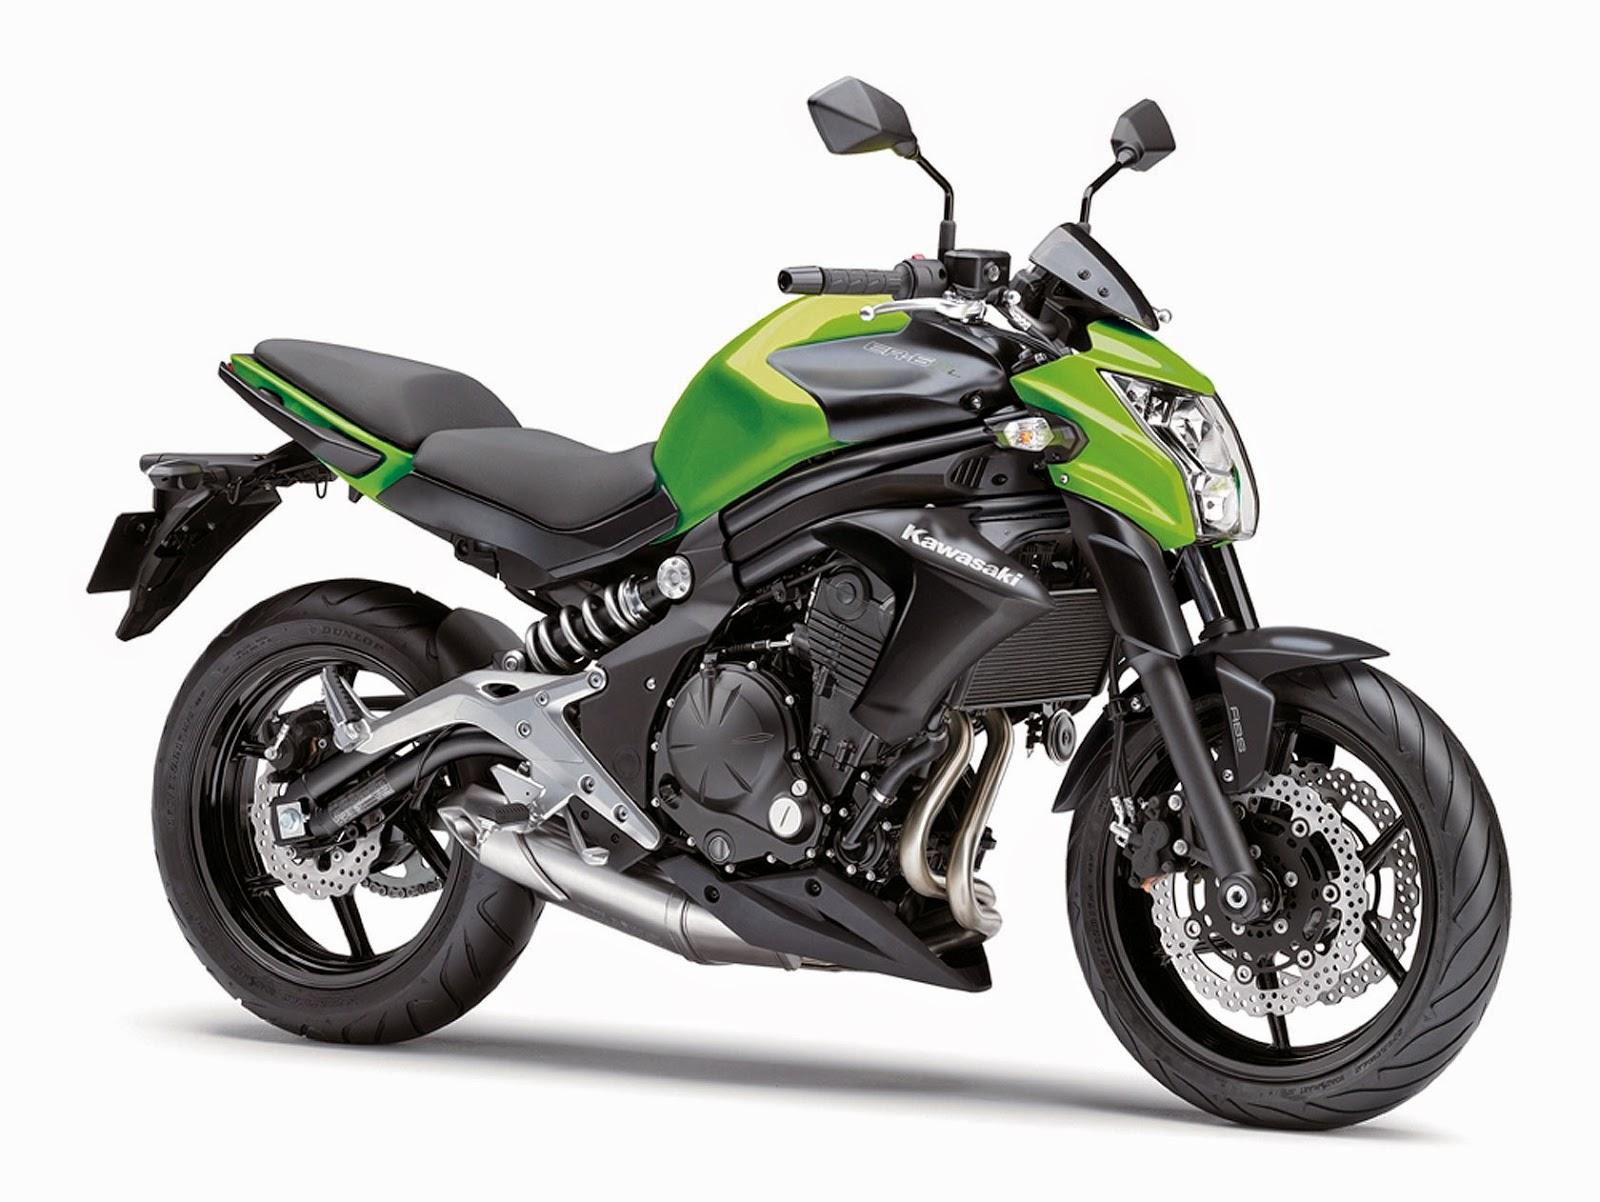 Kawasaki ER6nL ABS1 motorcycle